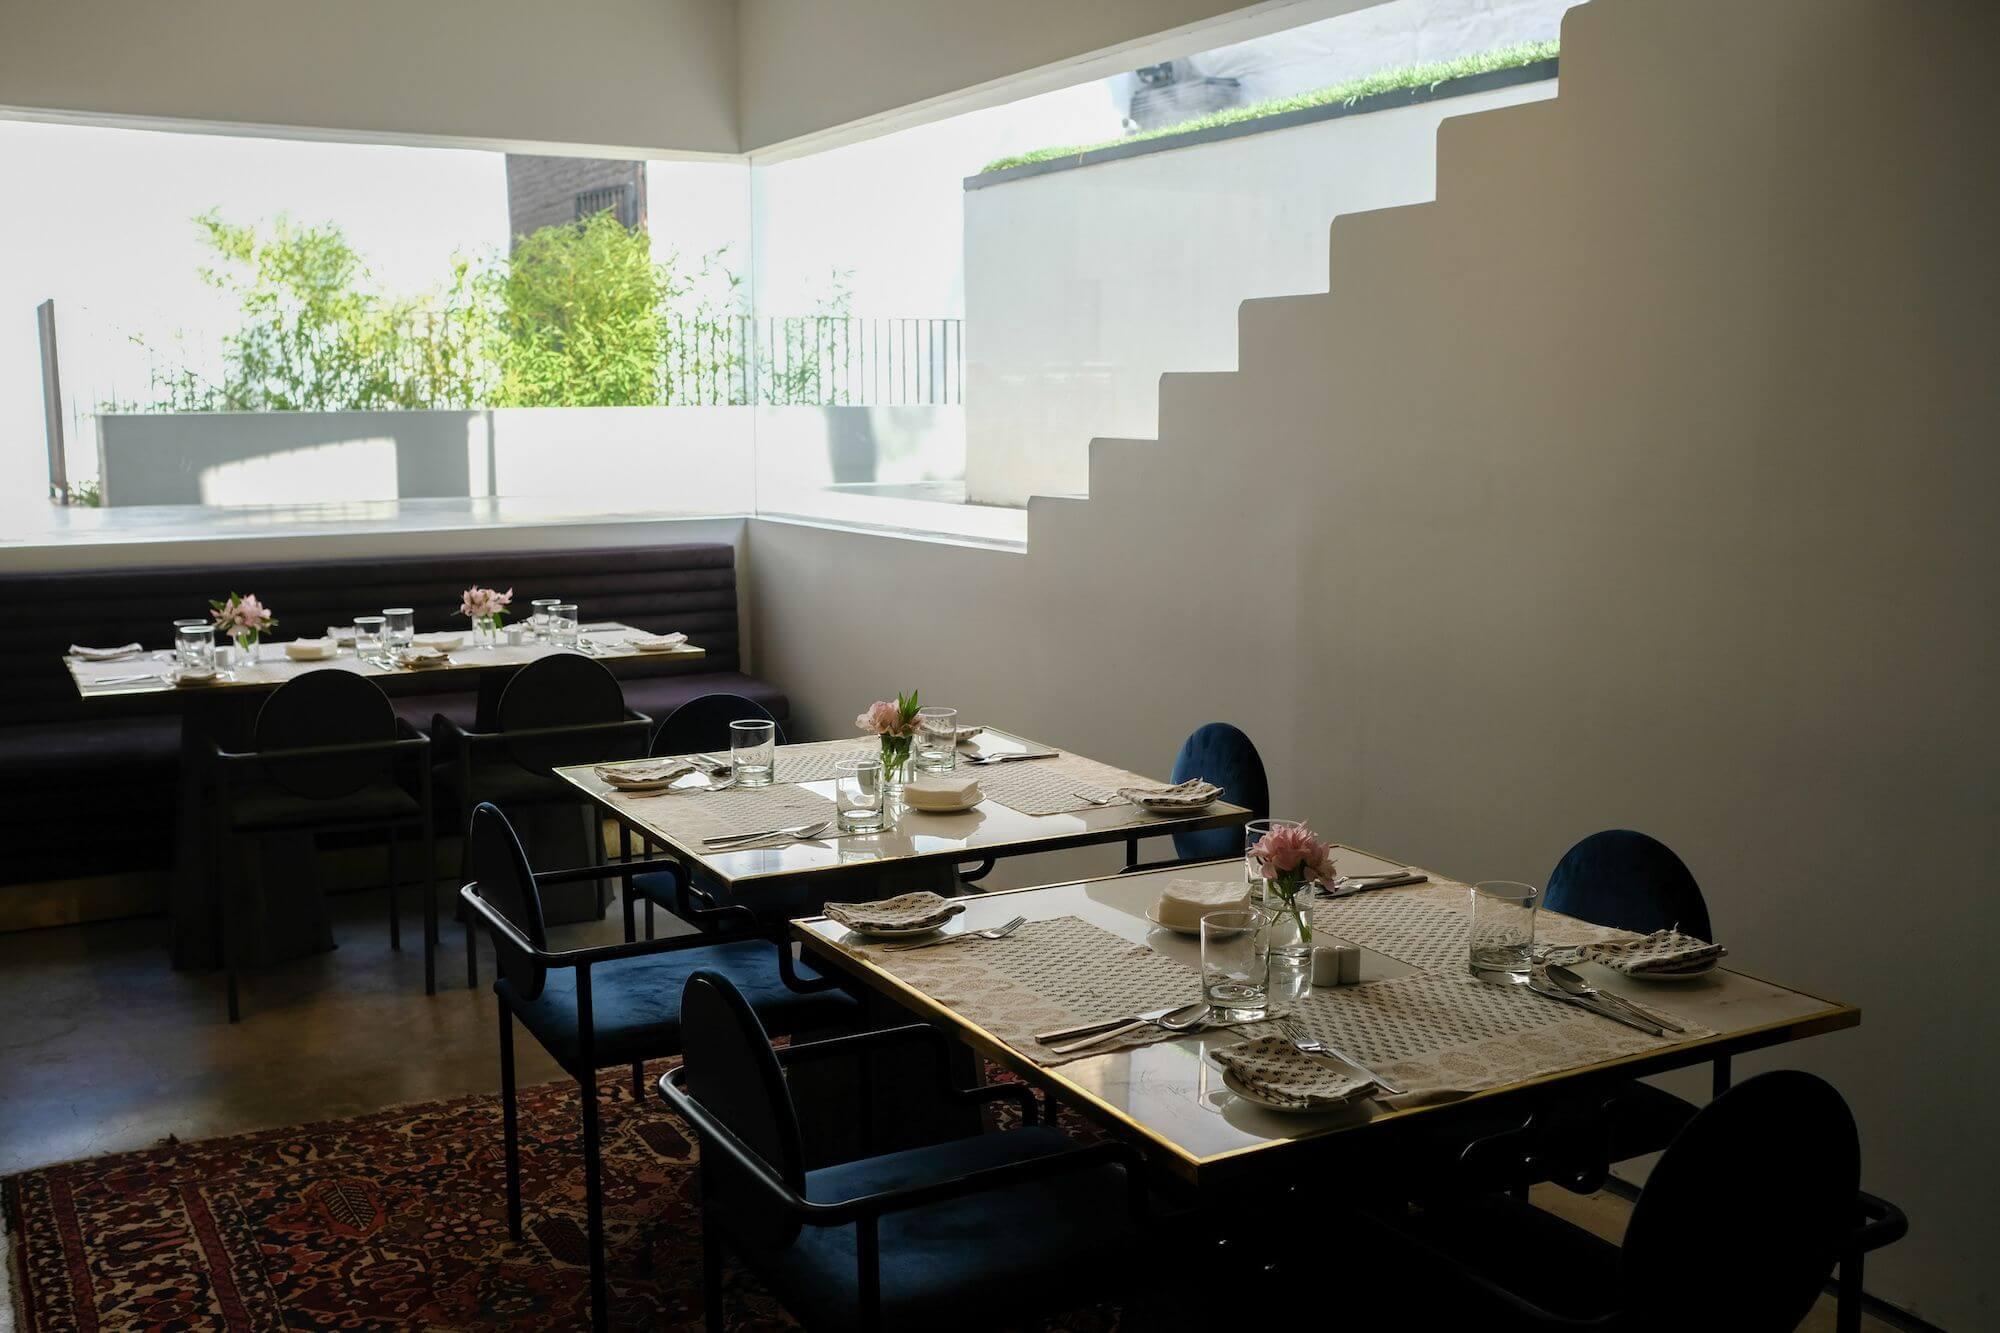 Teheran Hanna Restaurant 2 compressor 3 giorni a Teheran